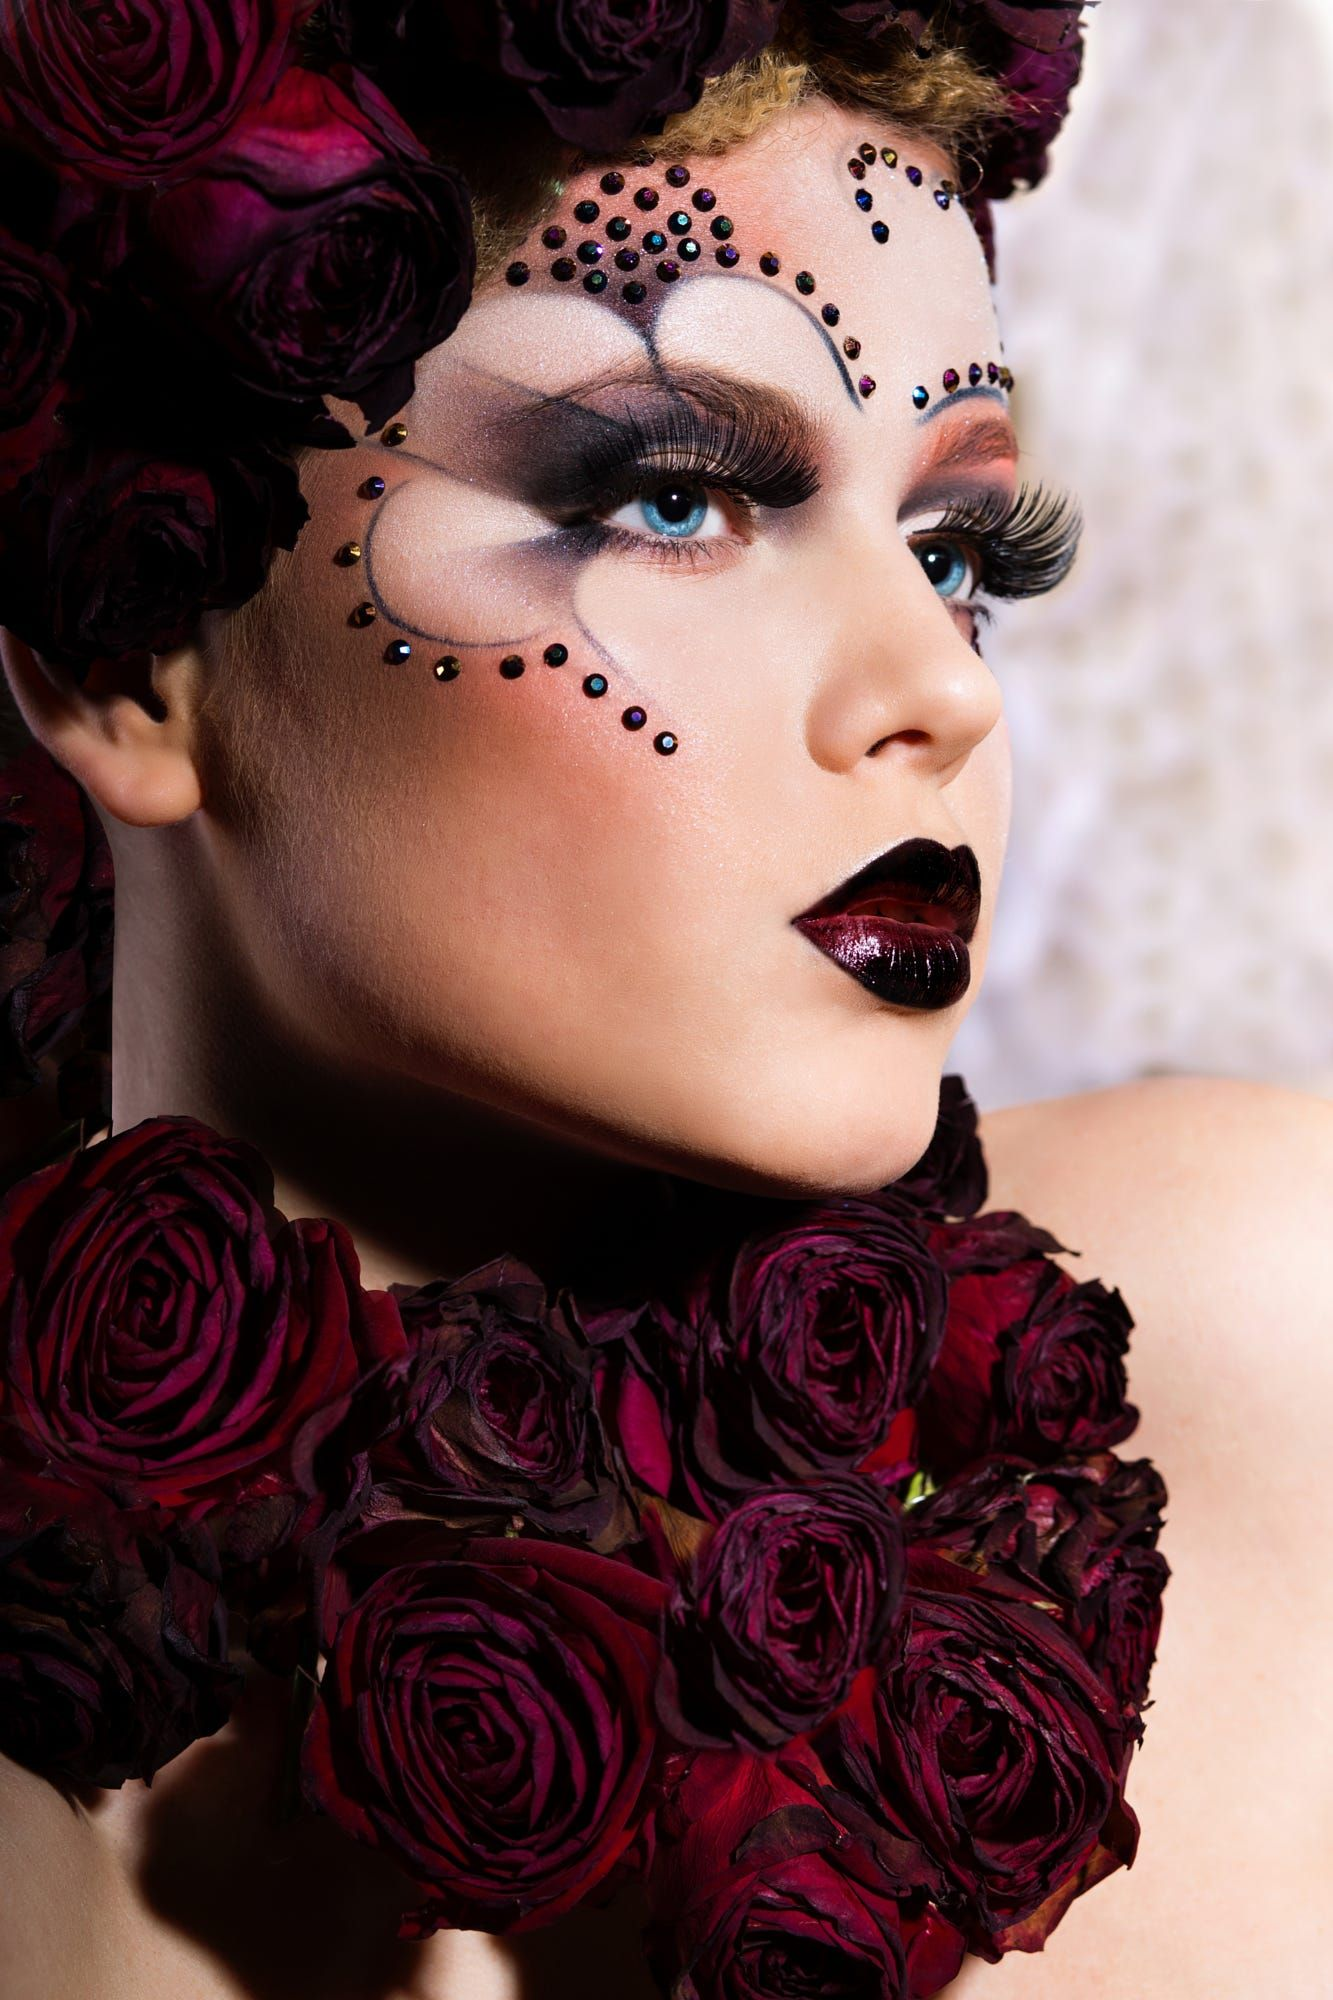 yana by Elena Sikorskaya Extreme makeup, Artistry makeup